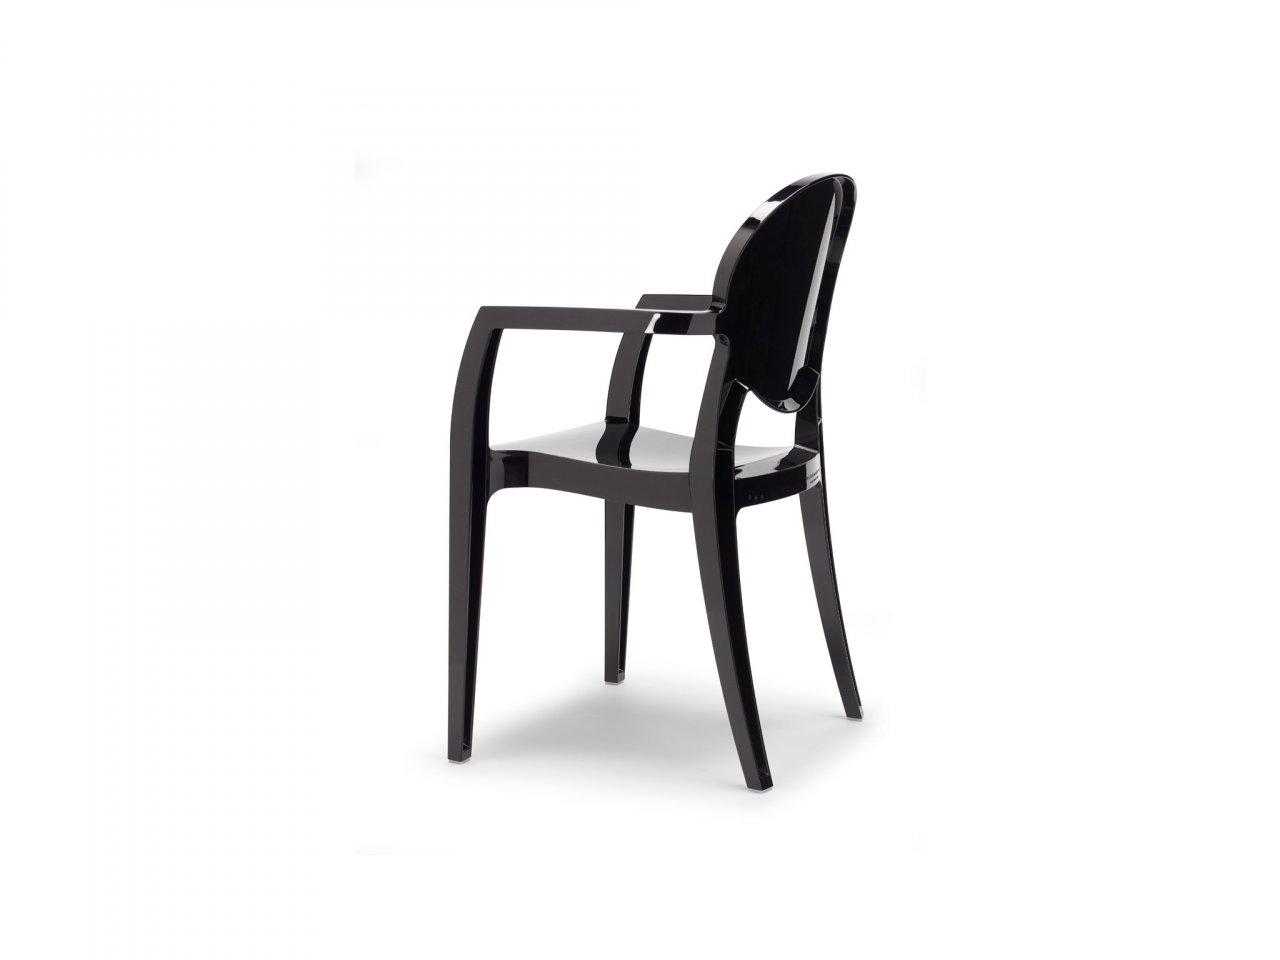 Sedia Con Braccioli Igloo - v9